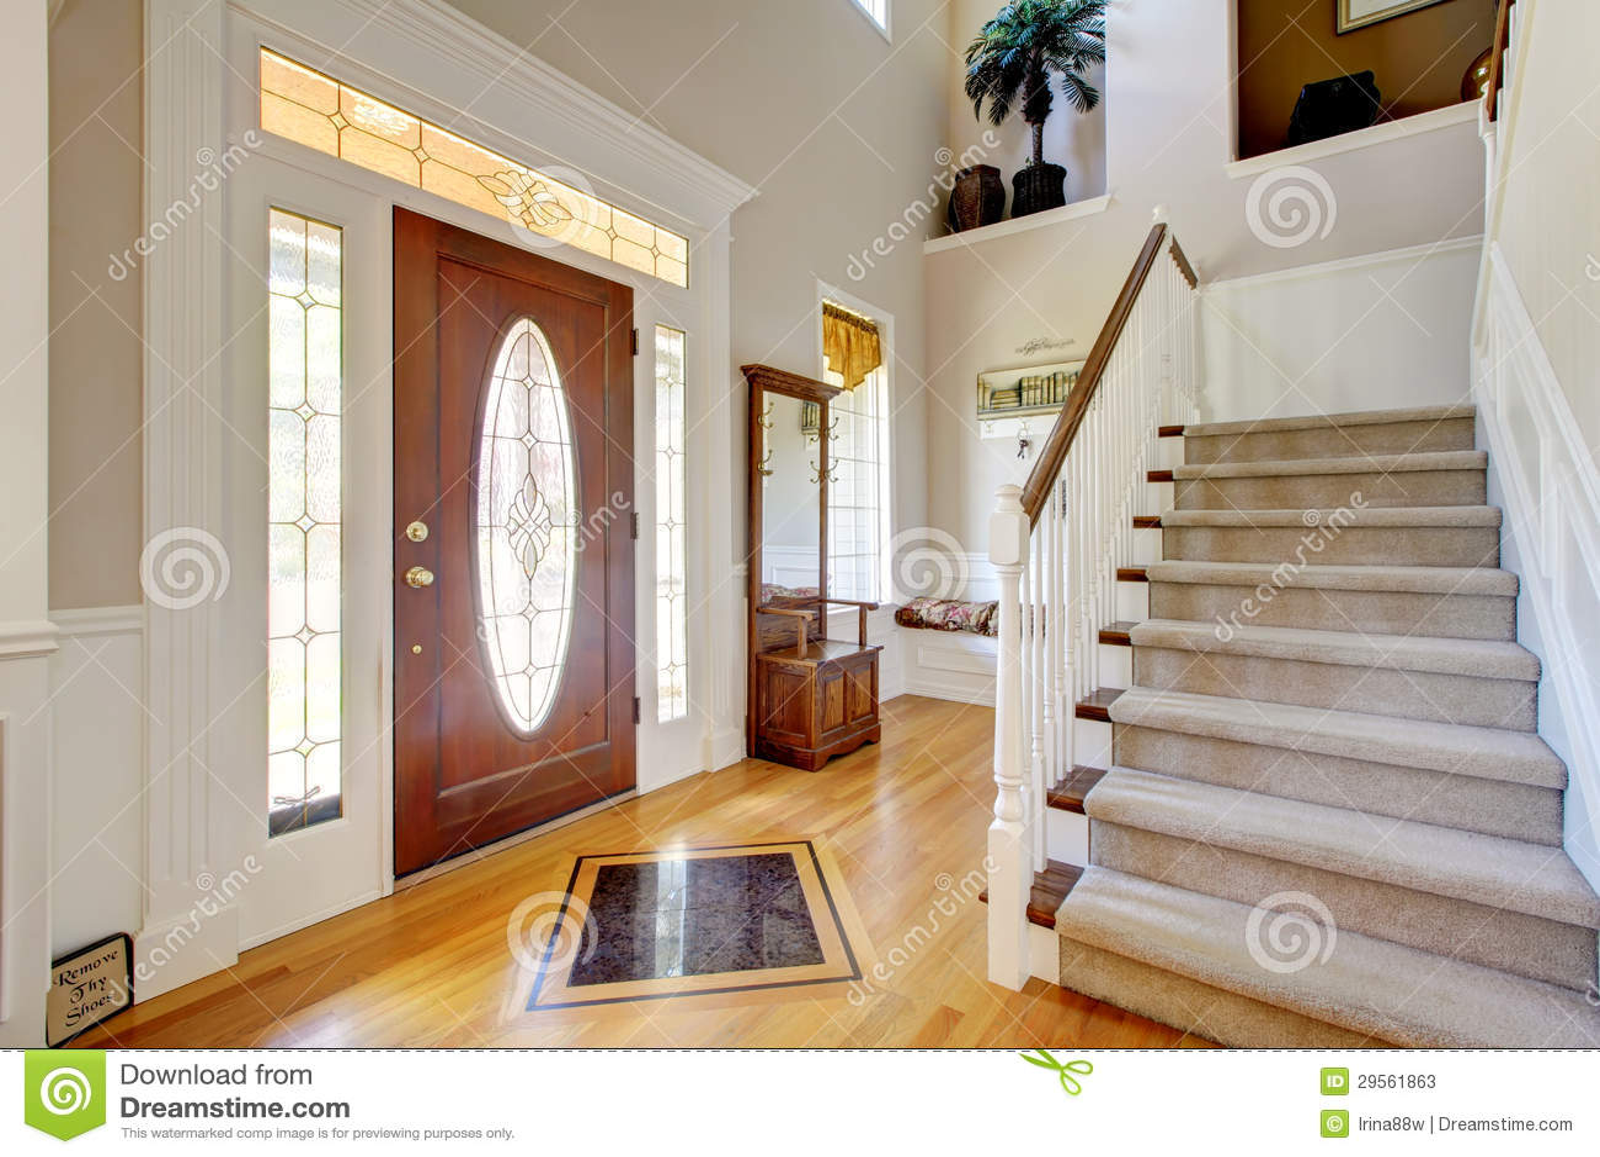 ... Home Entrance Interior With Staircase. Stock Photos - Image: 29561863